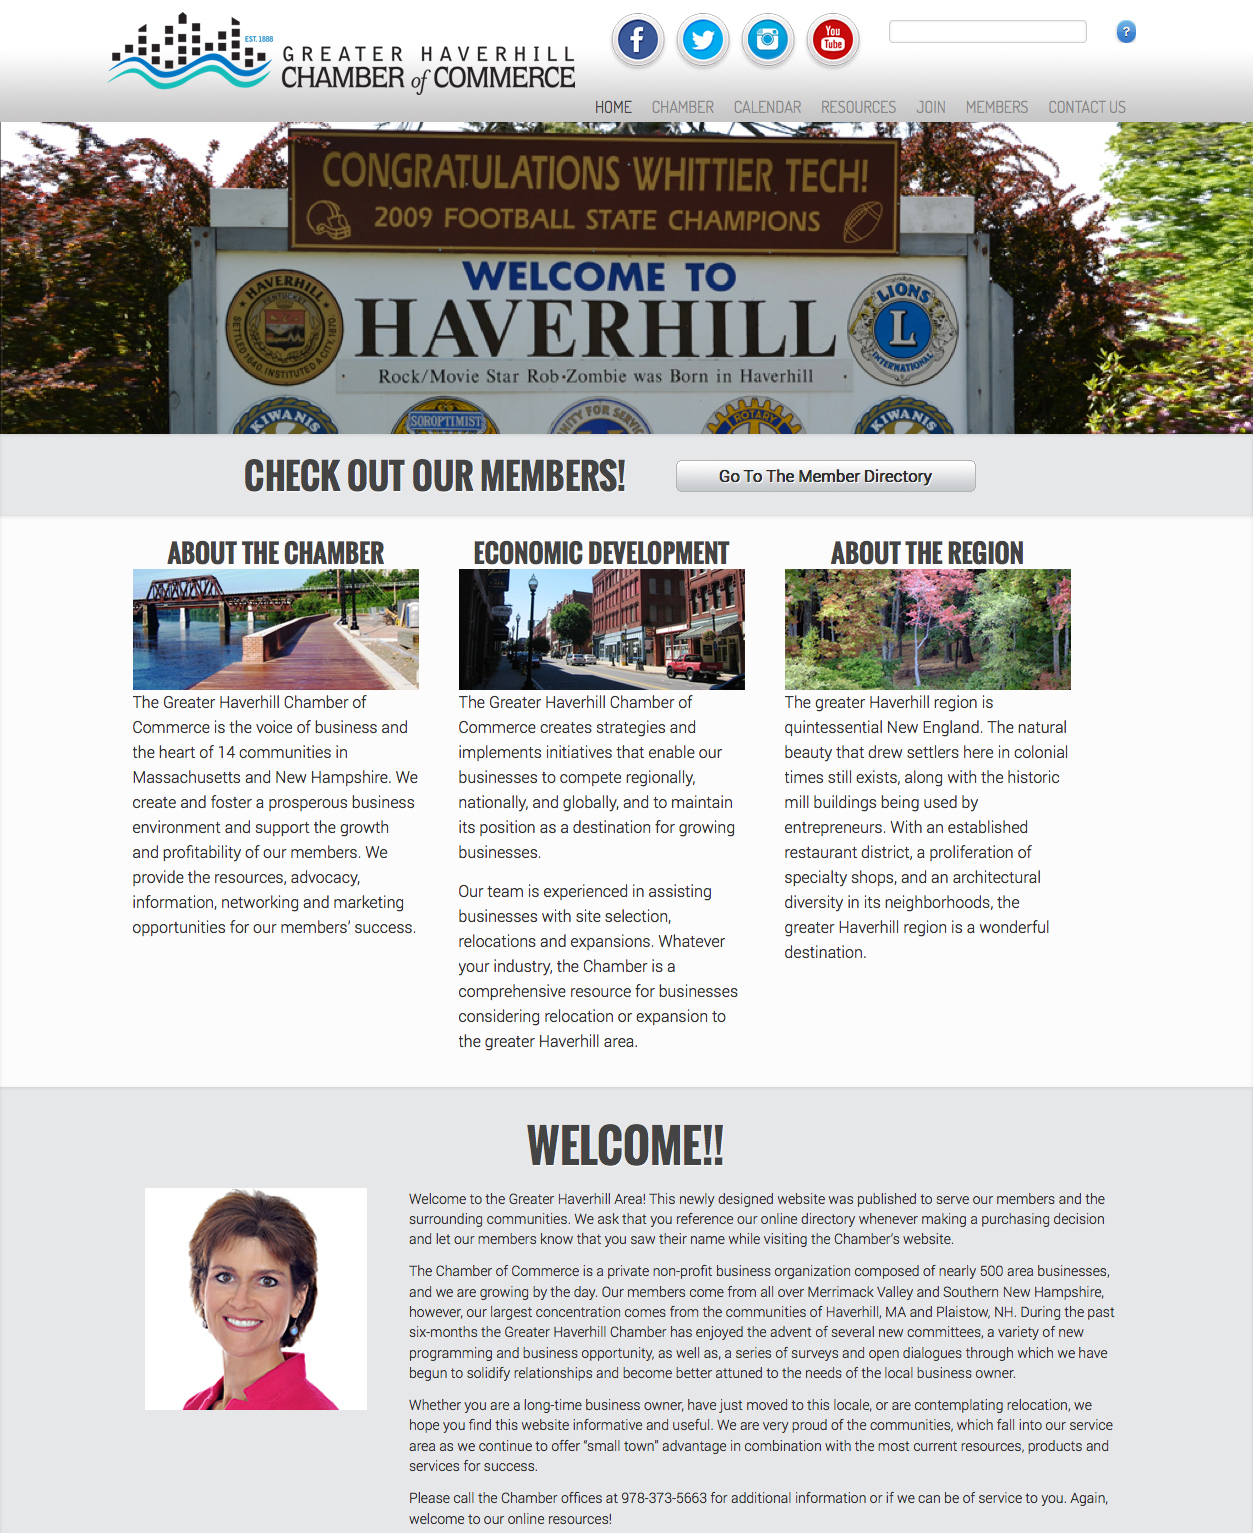 HaverhillChamberPartial